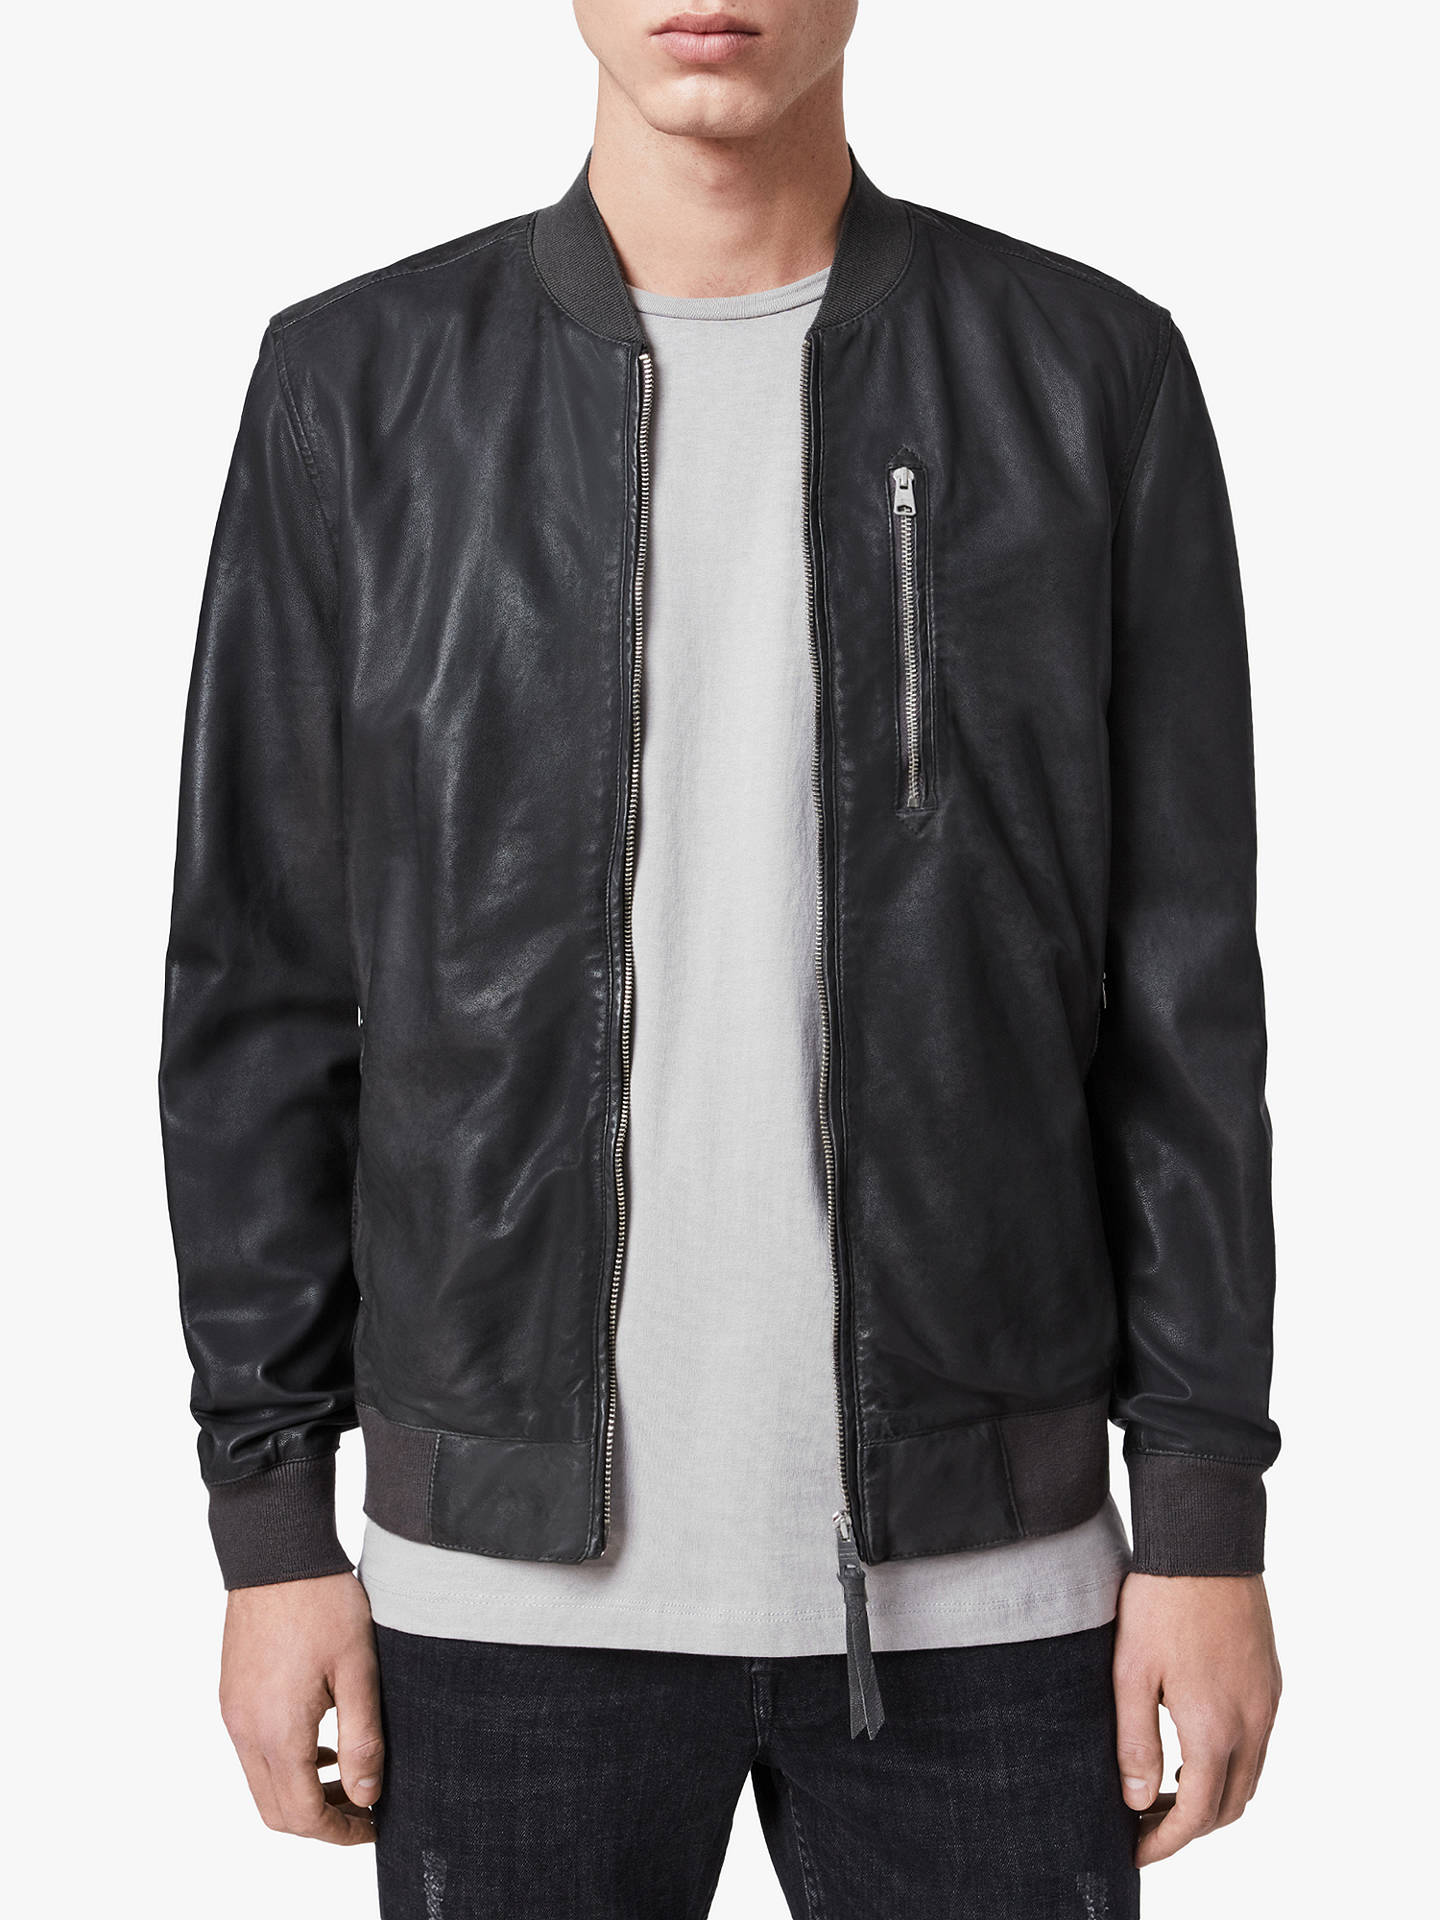 AllSaints Kino Leather Bomber Jacket, Deep Slate at John